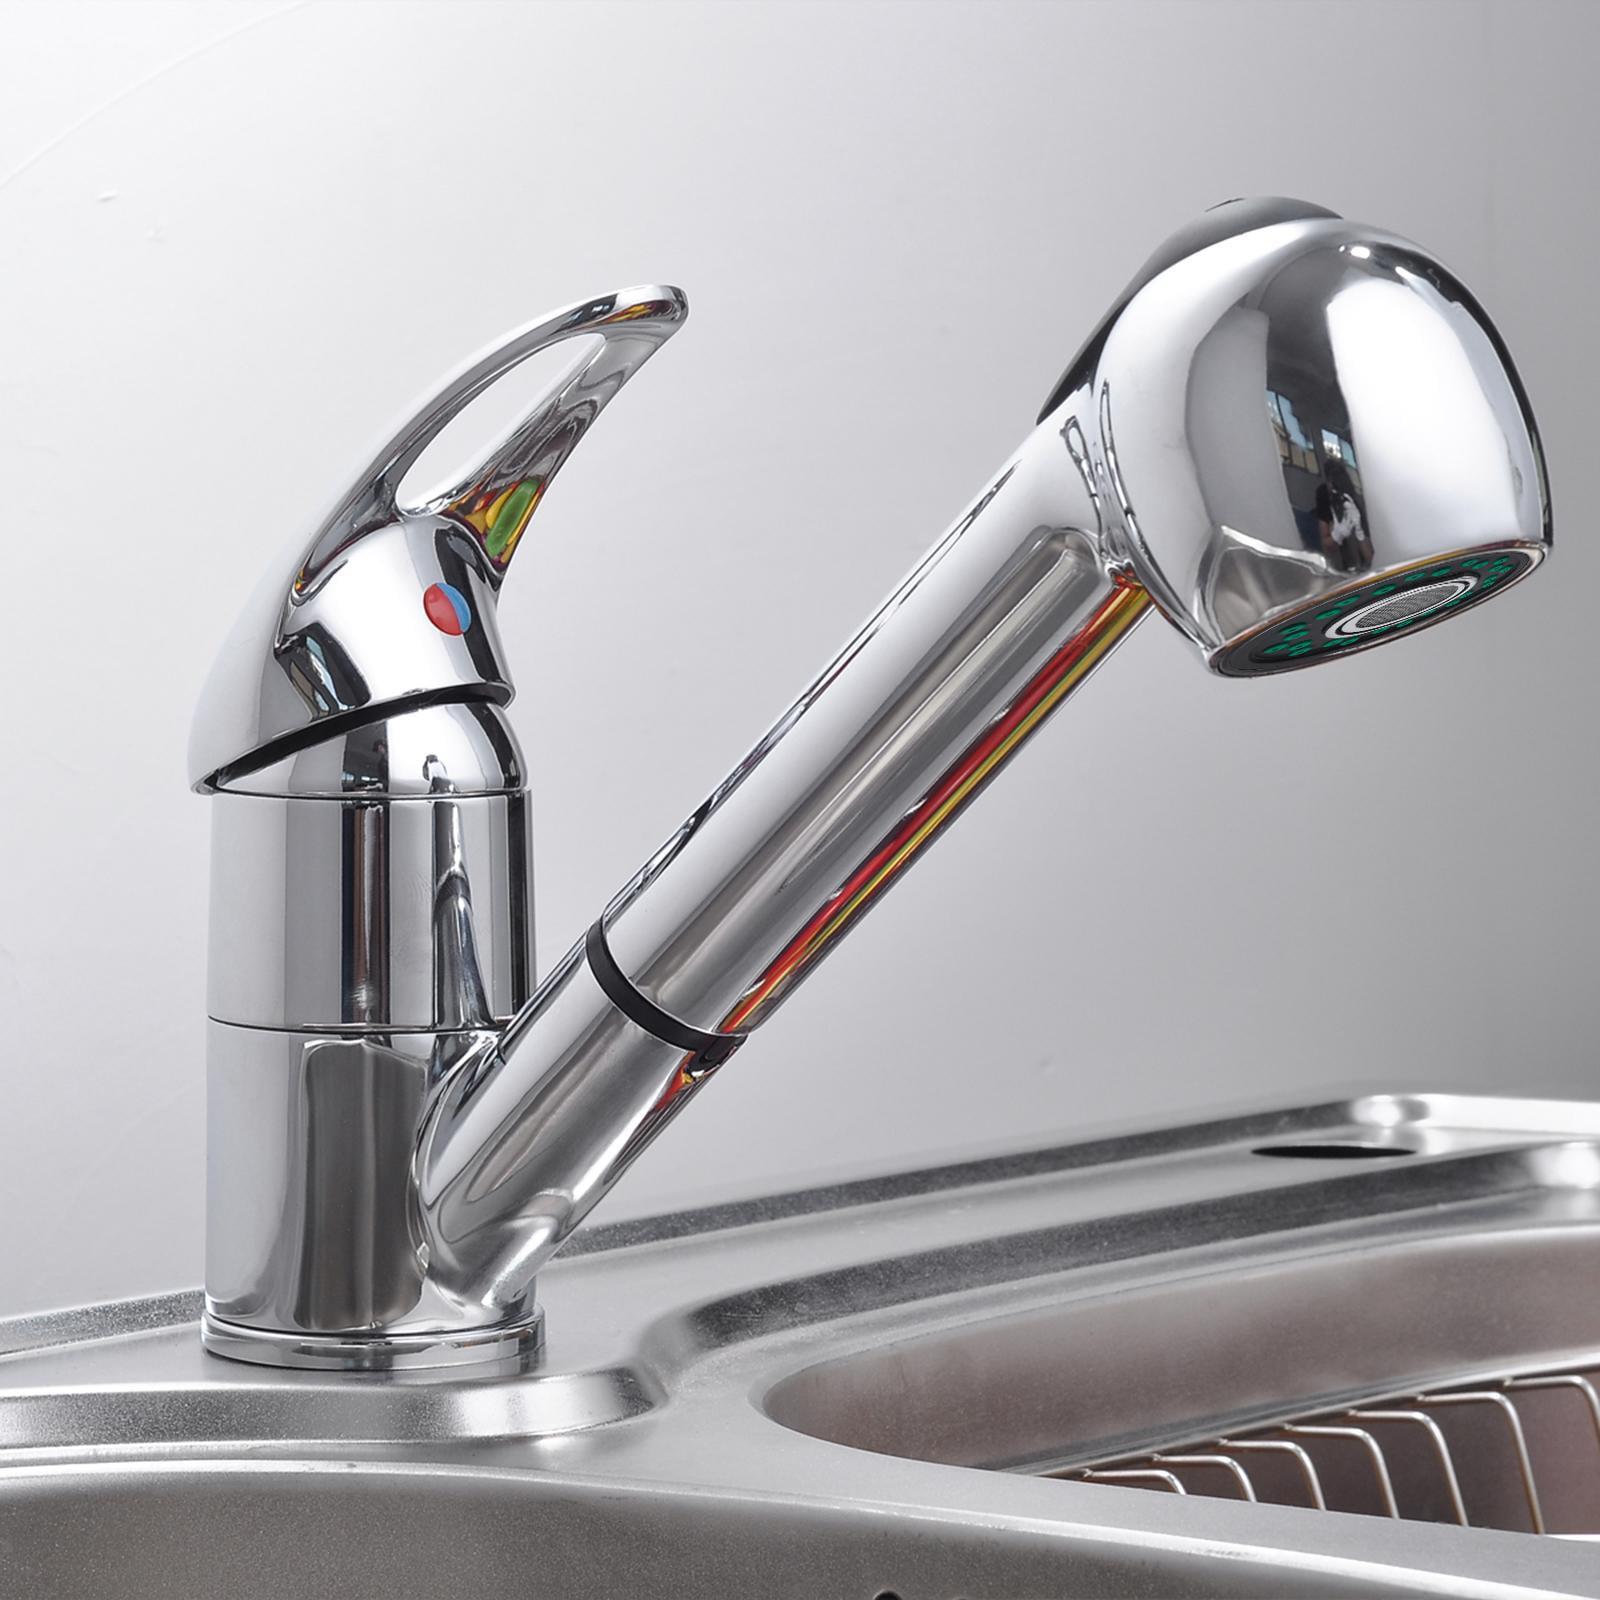 Leano Kitchen Sink Faucet Single Handle Bathroom Copper Swivel